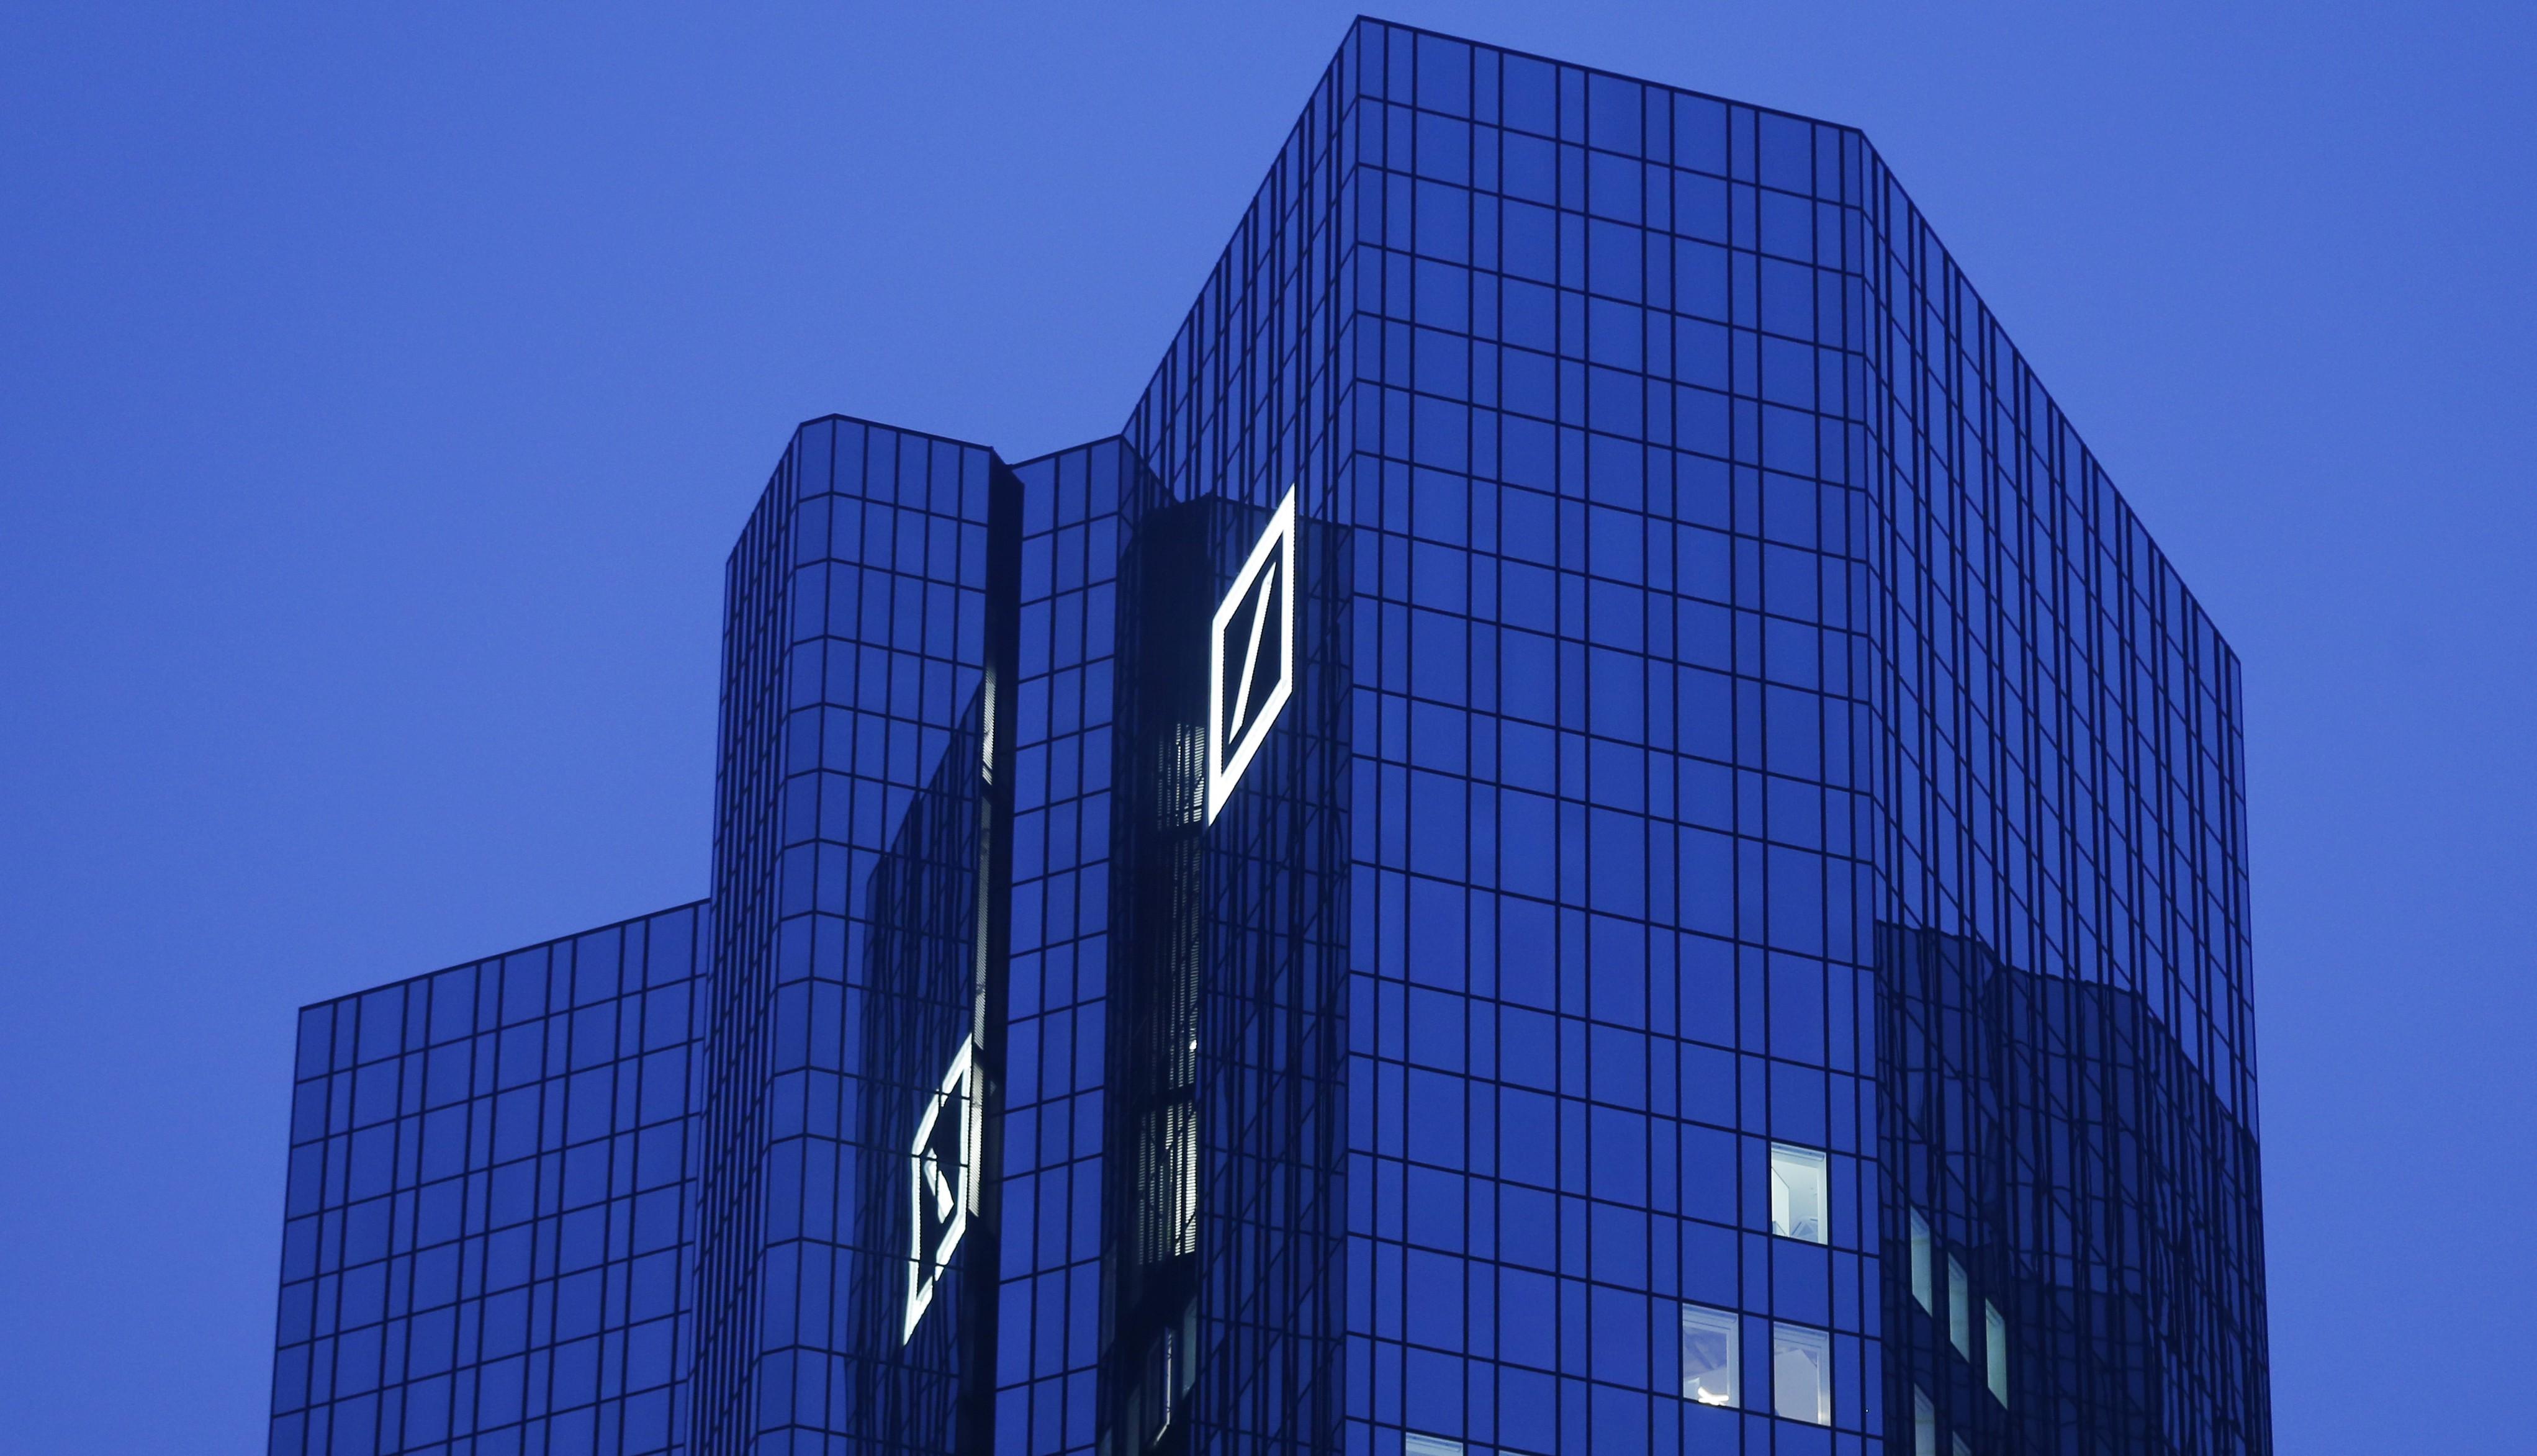 Headquarters of Deutsche Bank is photographed in Frankfurt, Germany, Thursday, Dec. 10, 2015.